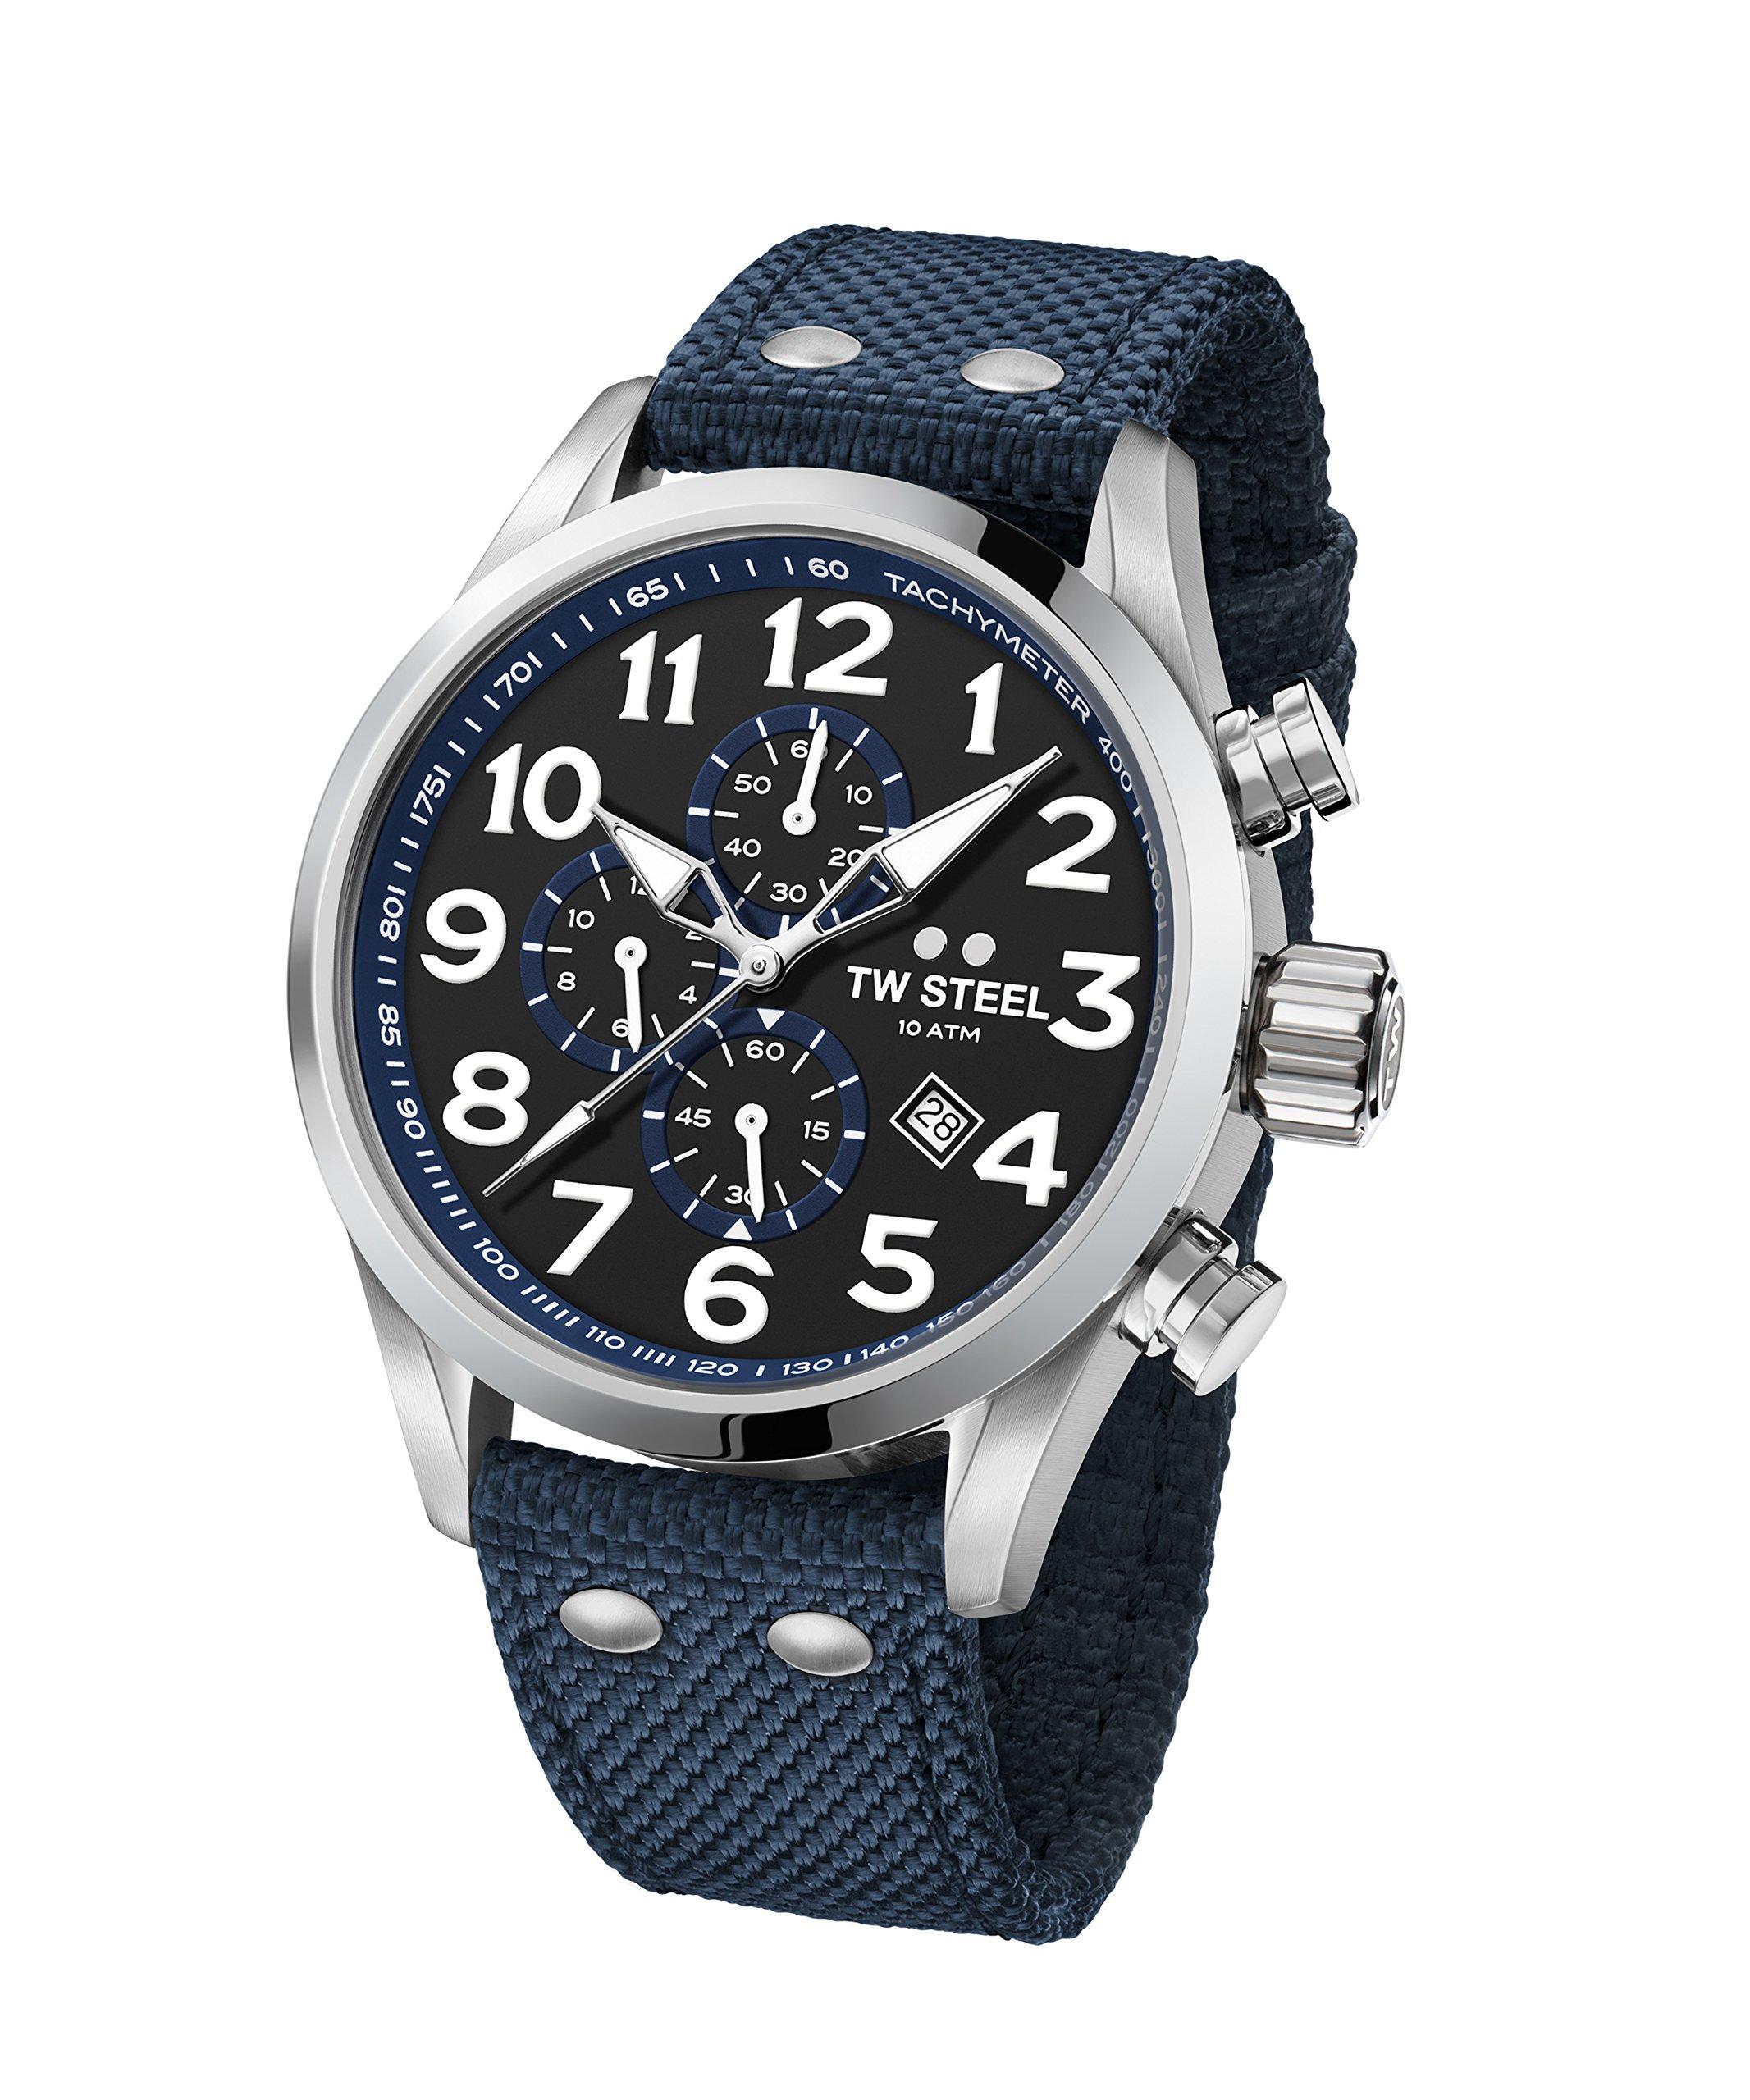 TW Steel Men's Volante Stainless Steel Japanese-Quartz Watch with Nylon Strap, Blue, 22 (Model: VS33)